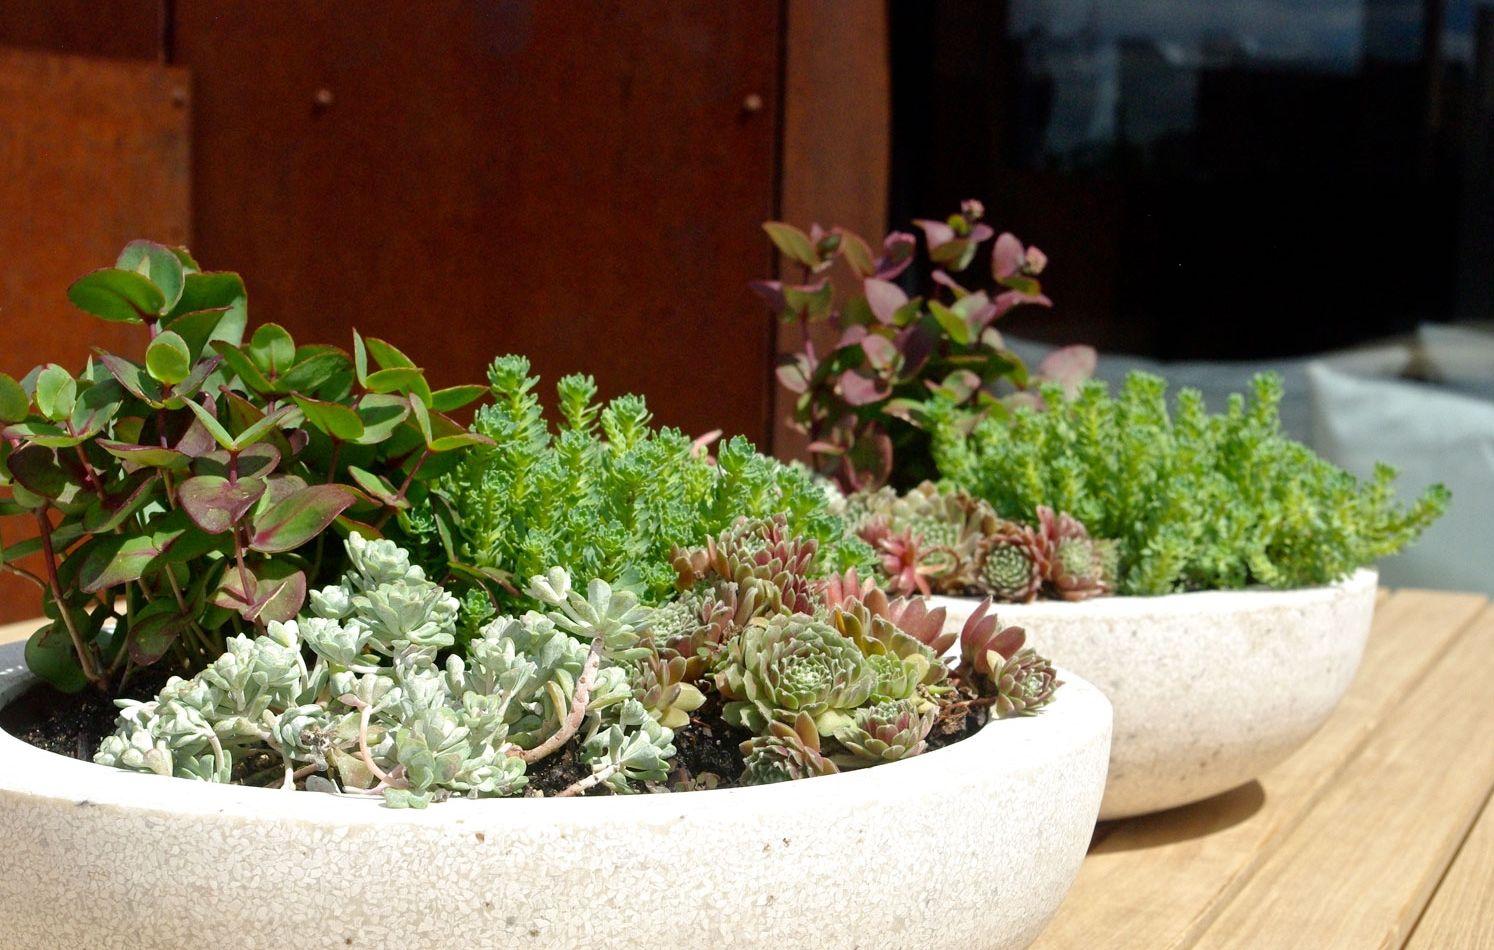 Williamsburg, Brooklyn Rooftop Garden, modern design, sedum and succulent bowls, DWR table